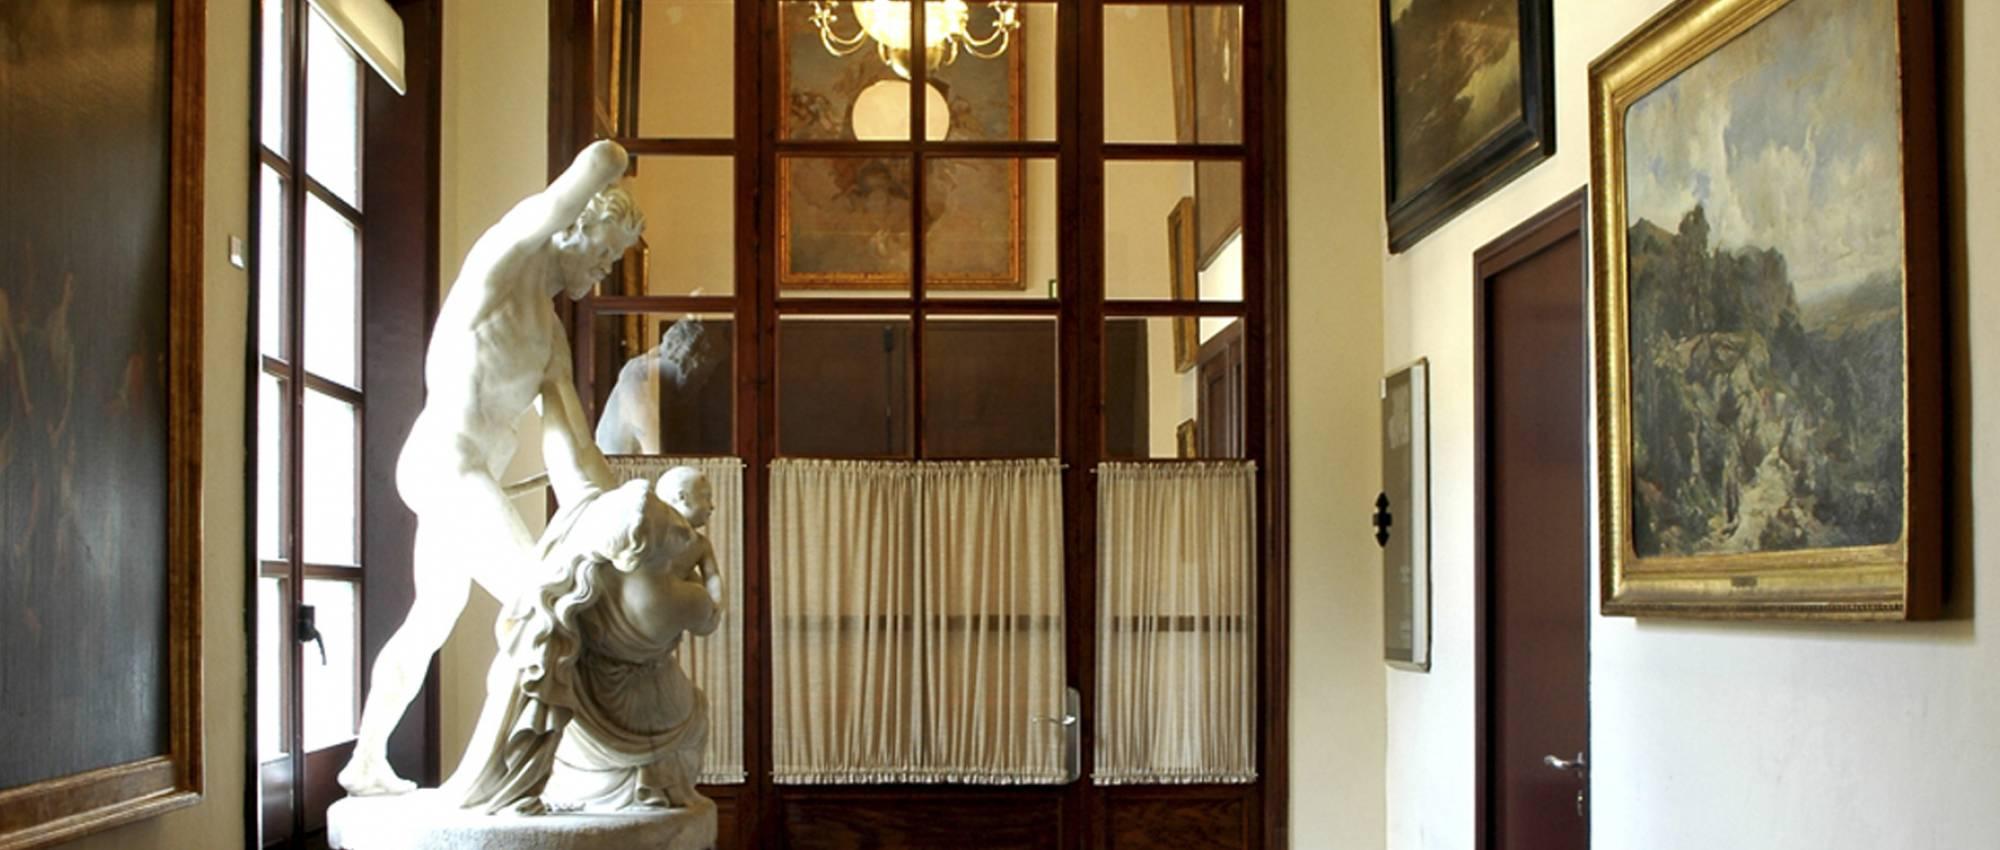 Pasillo de entrada a la Real Academia Catalana de Bellas Artes de San Jorge. RACBASJ / Wikimedia Commons. Domini públic